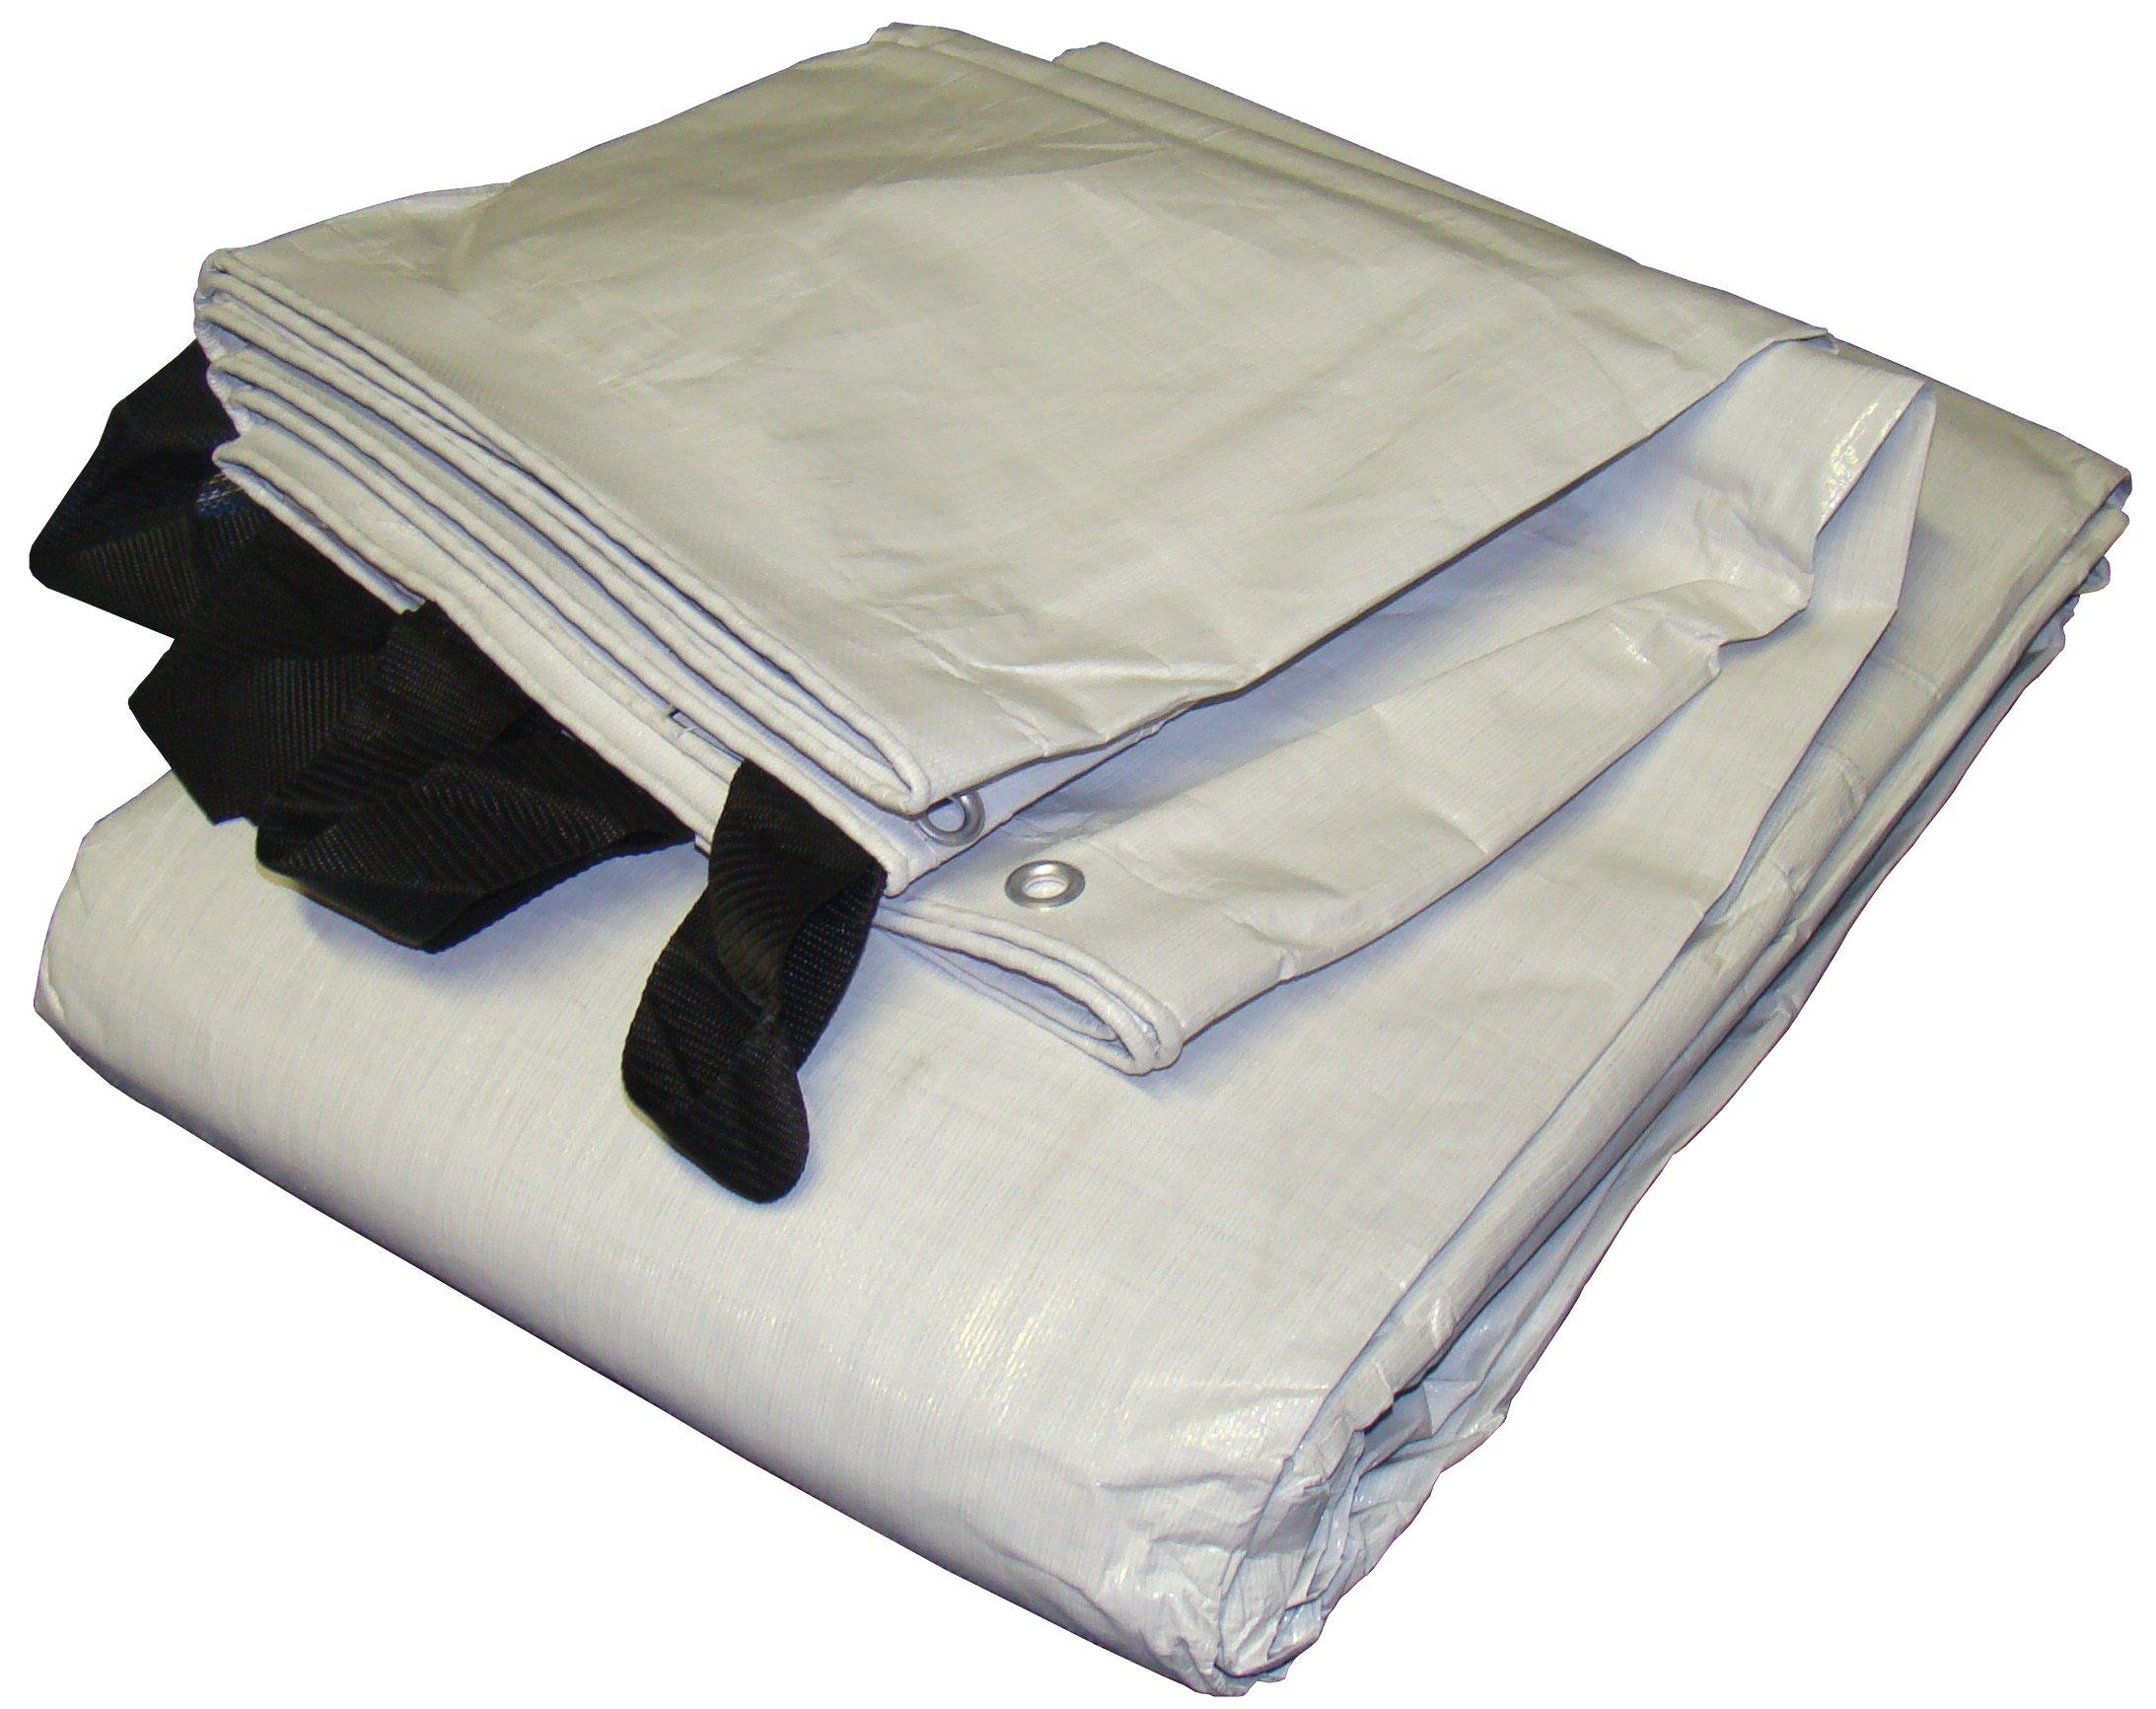 12' x 30' White & Black Reversible Extra Heavy Duty Tarp by Hay Cover